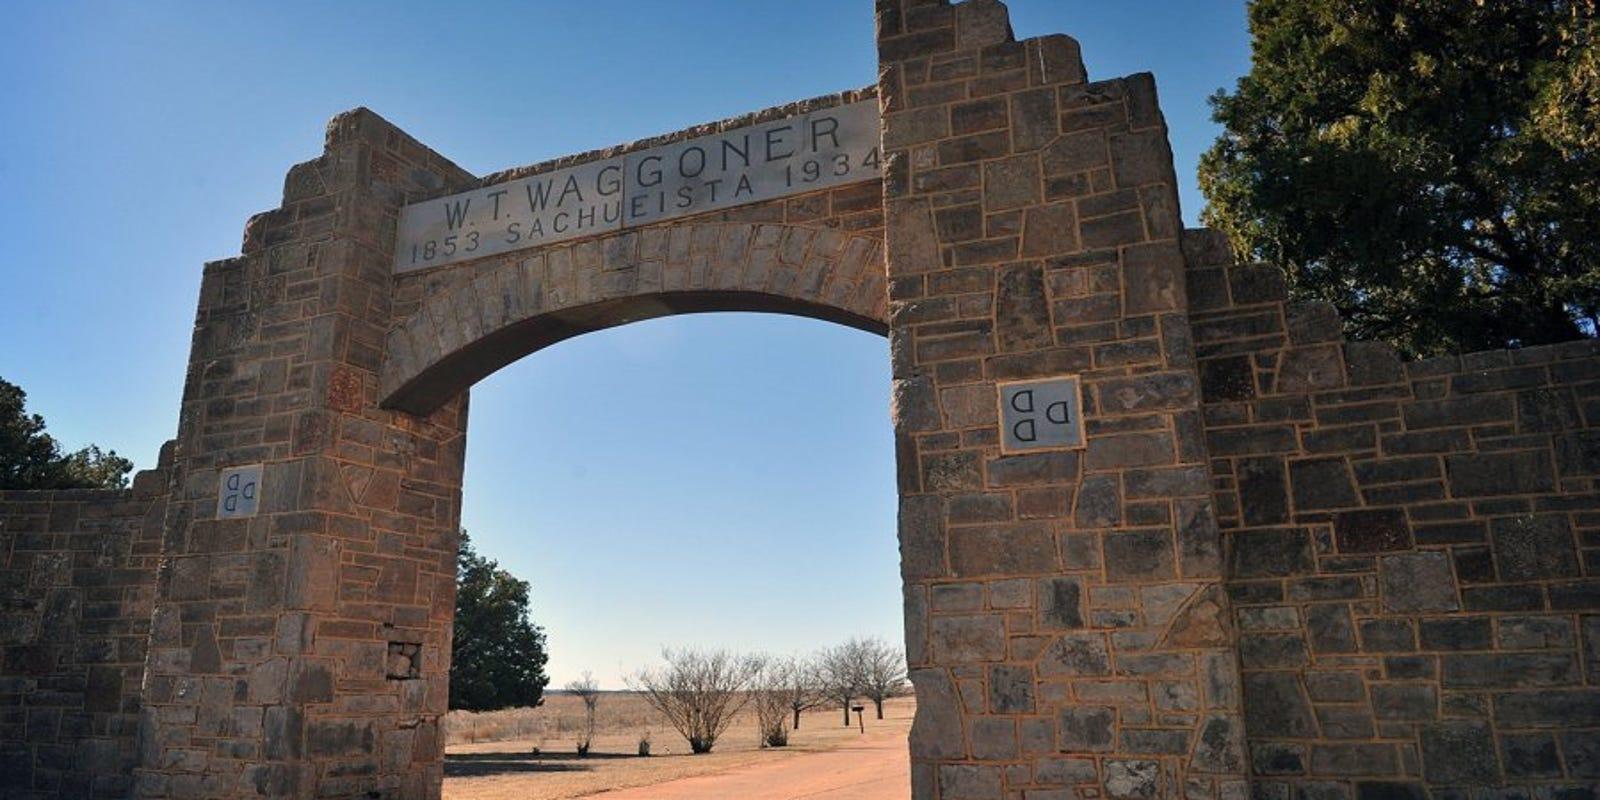 W.T. Waggoner Ranch: Kroenke right buyer for Waggoner Ranch